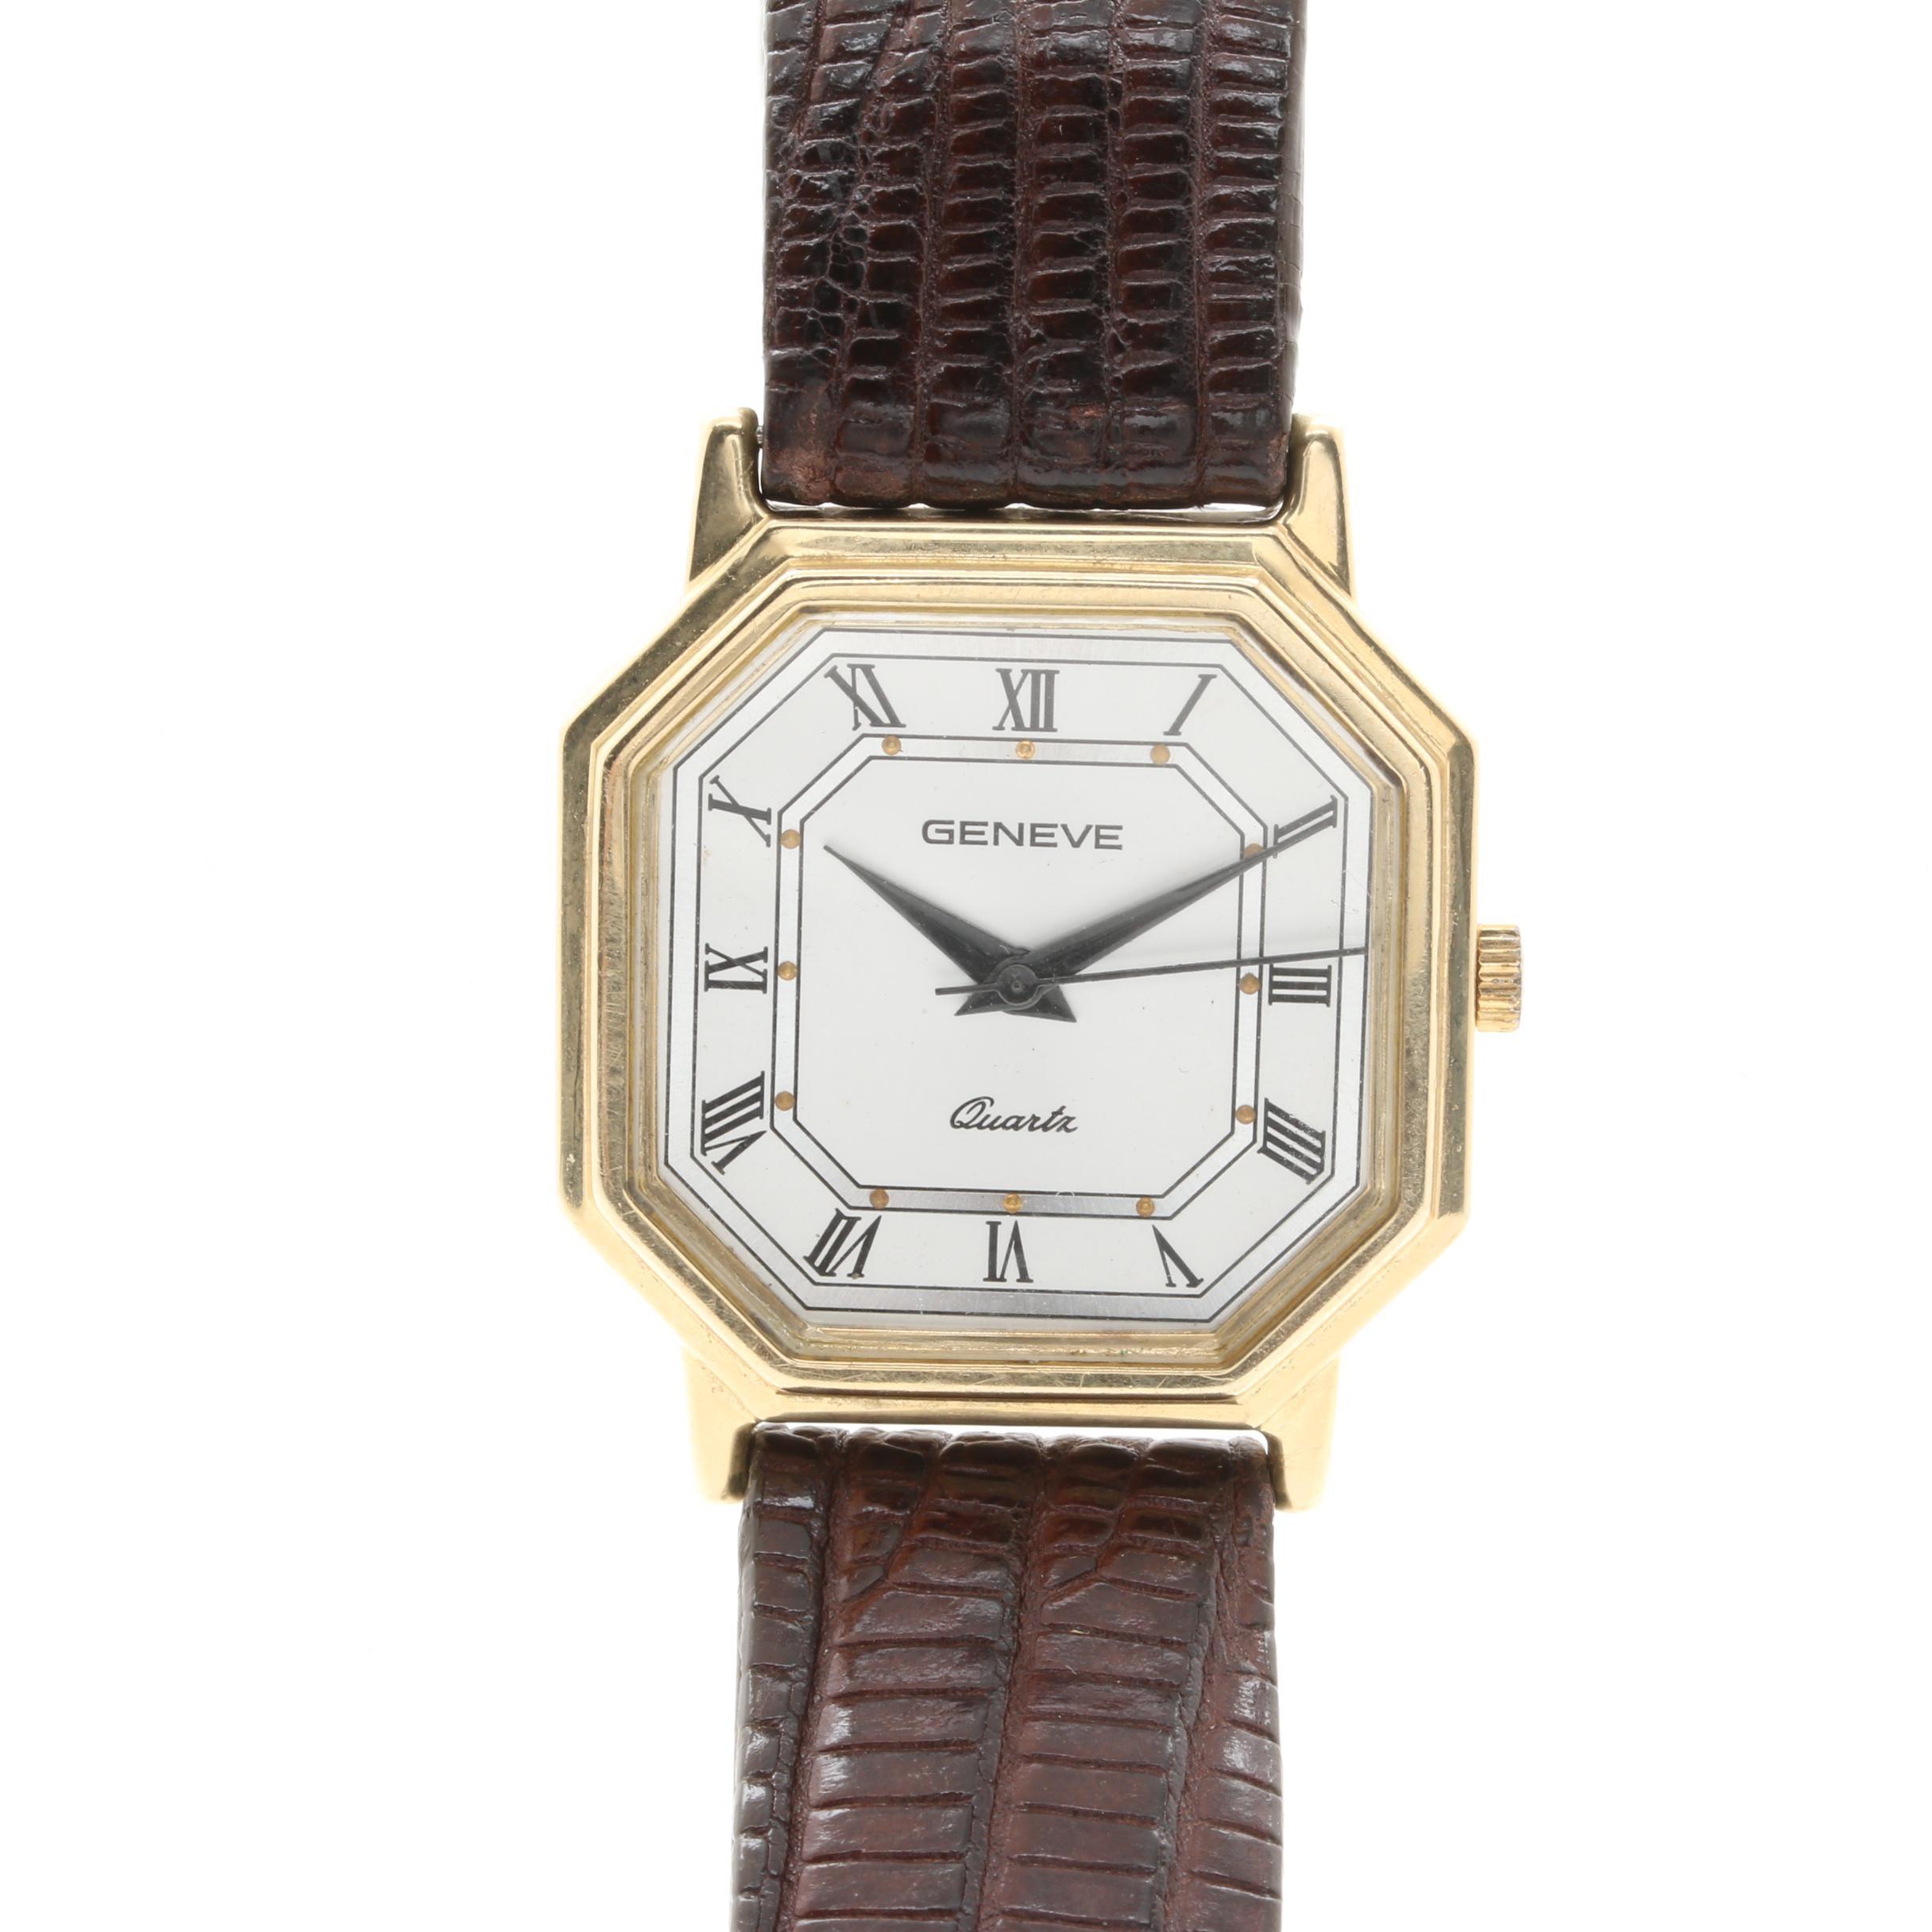 Vintage Geneve 14K Yellow Gold Wristwatch